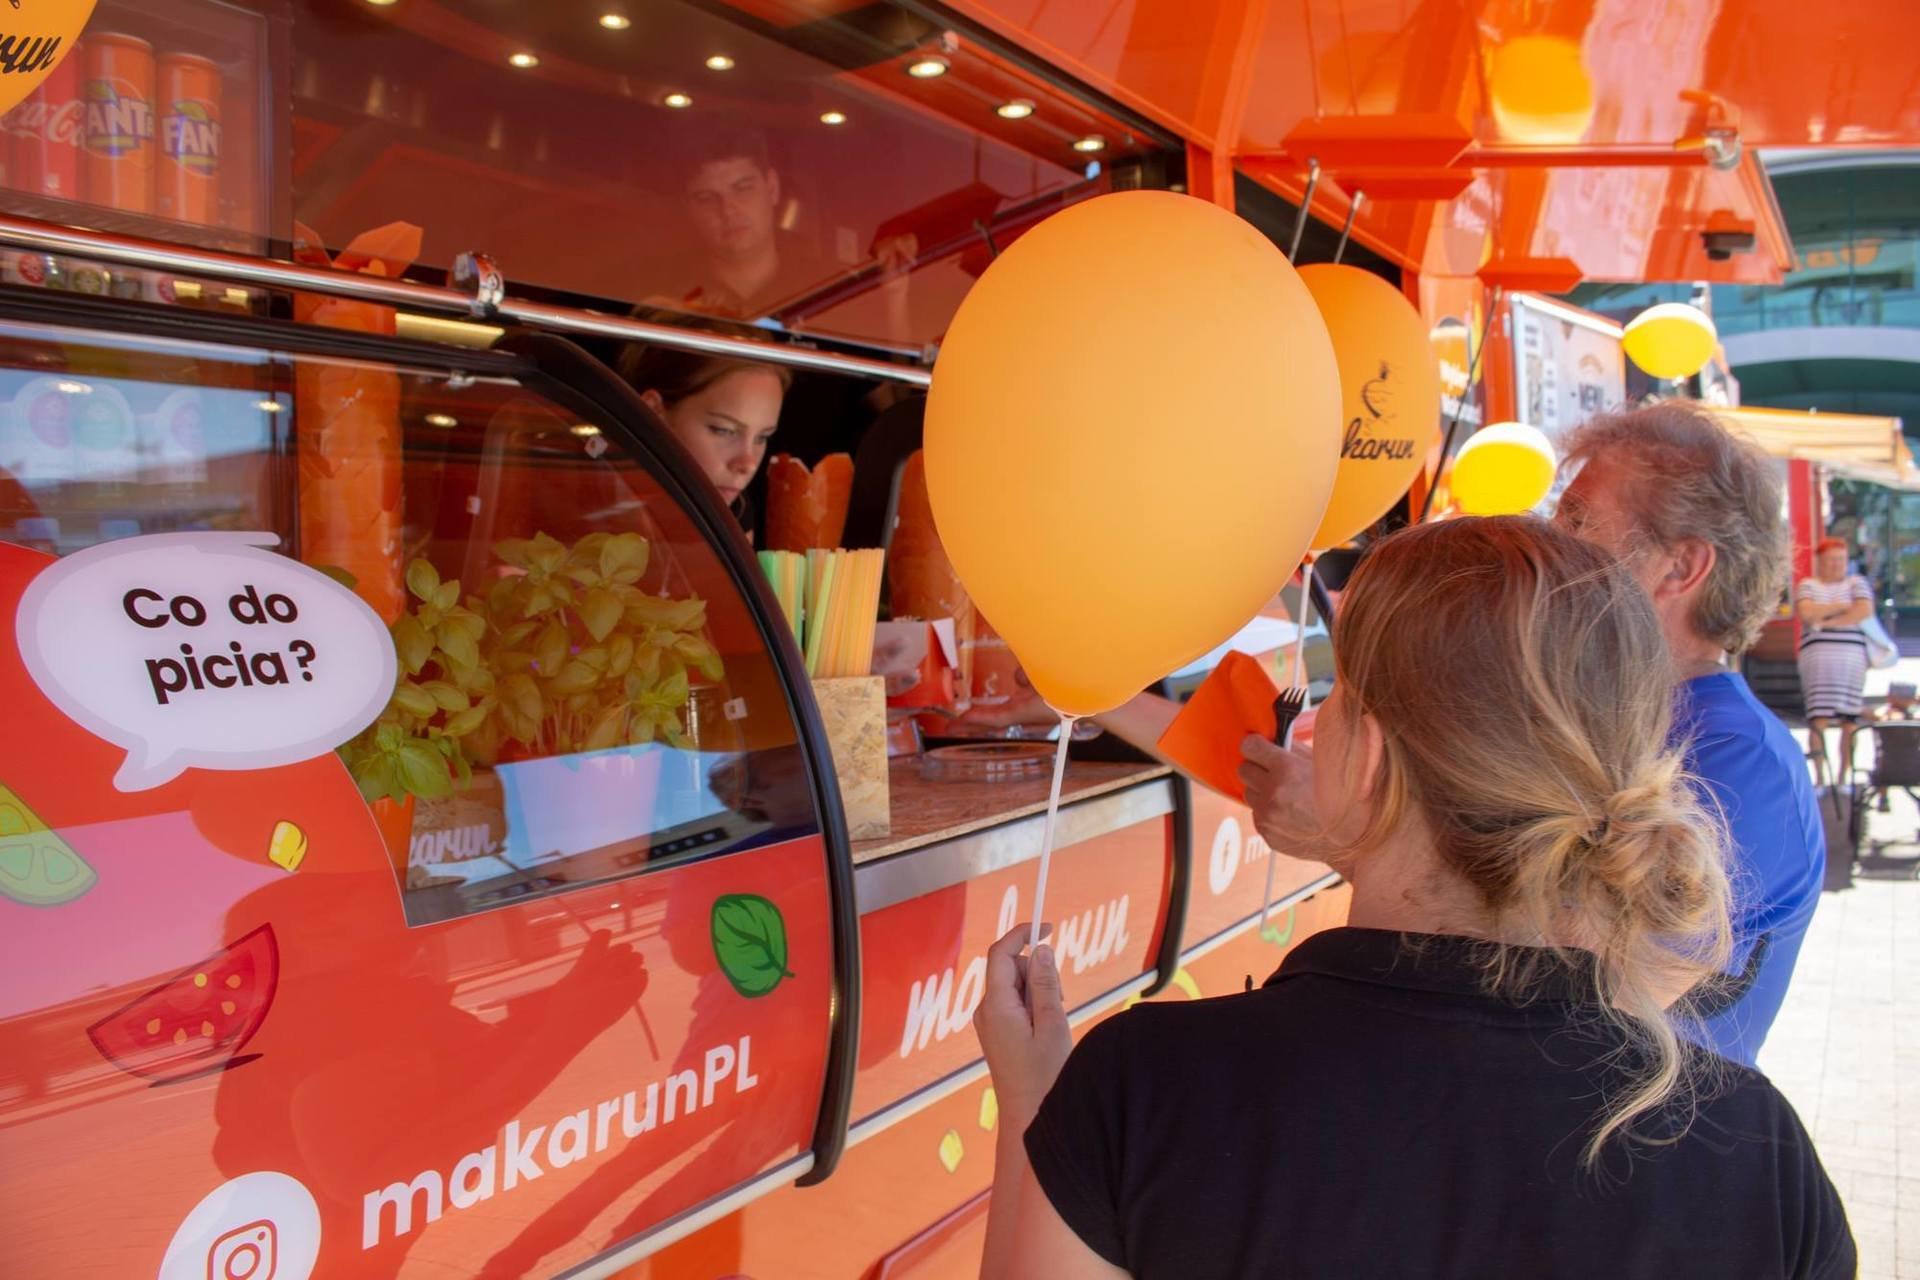 Trafiona lokalizacja makarunowego Food Trucka